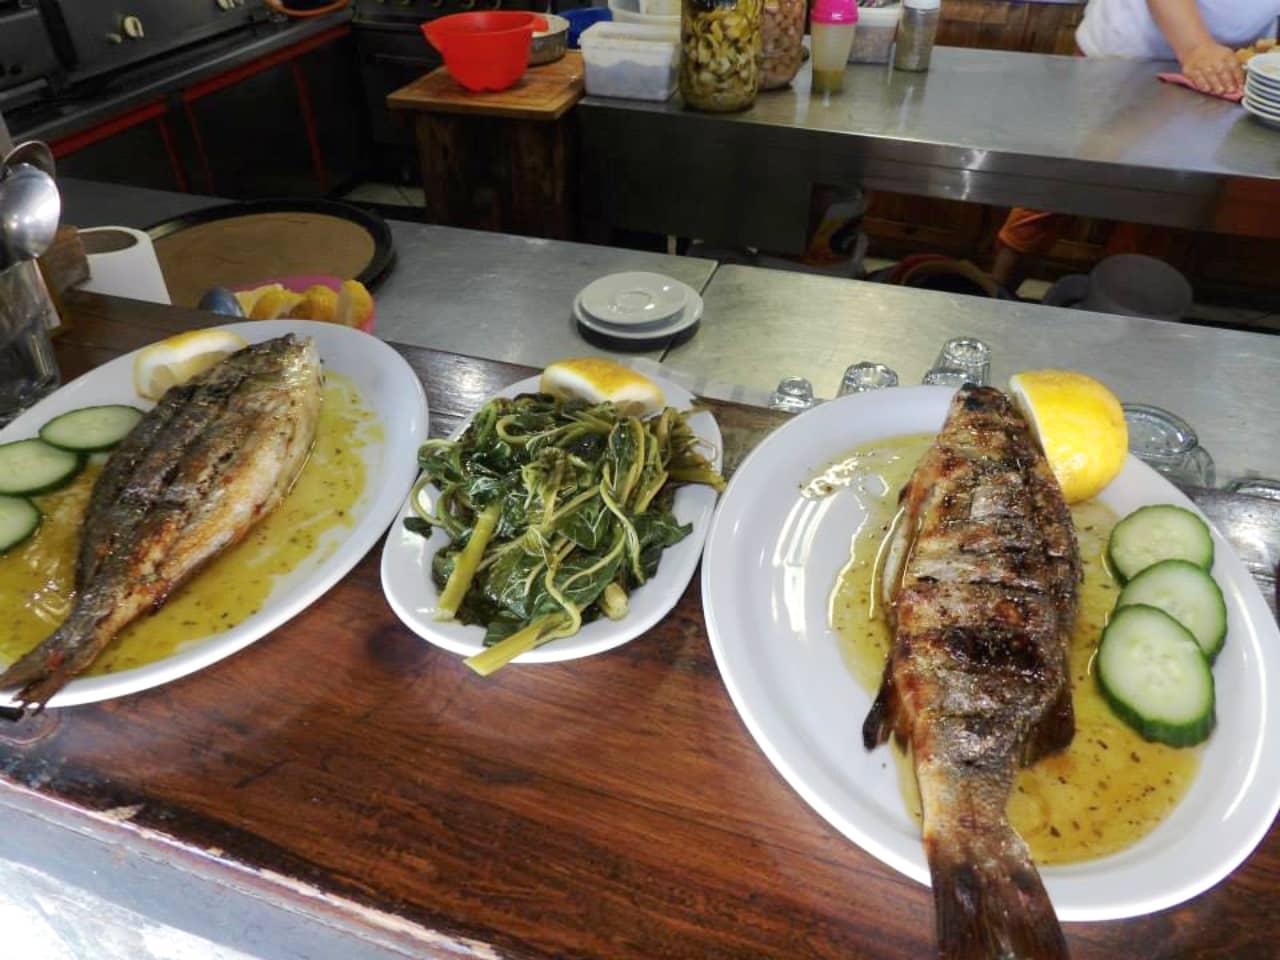 agia fotia taverna, agia fotini taverna rethimno crete, south rethimno best restaurant, agia fotia kerames rethimno